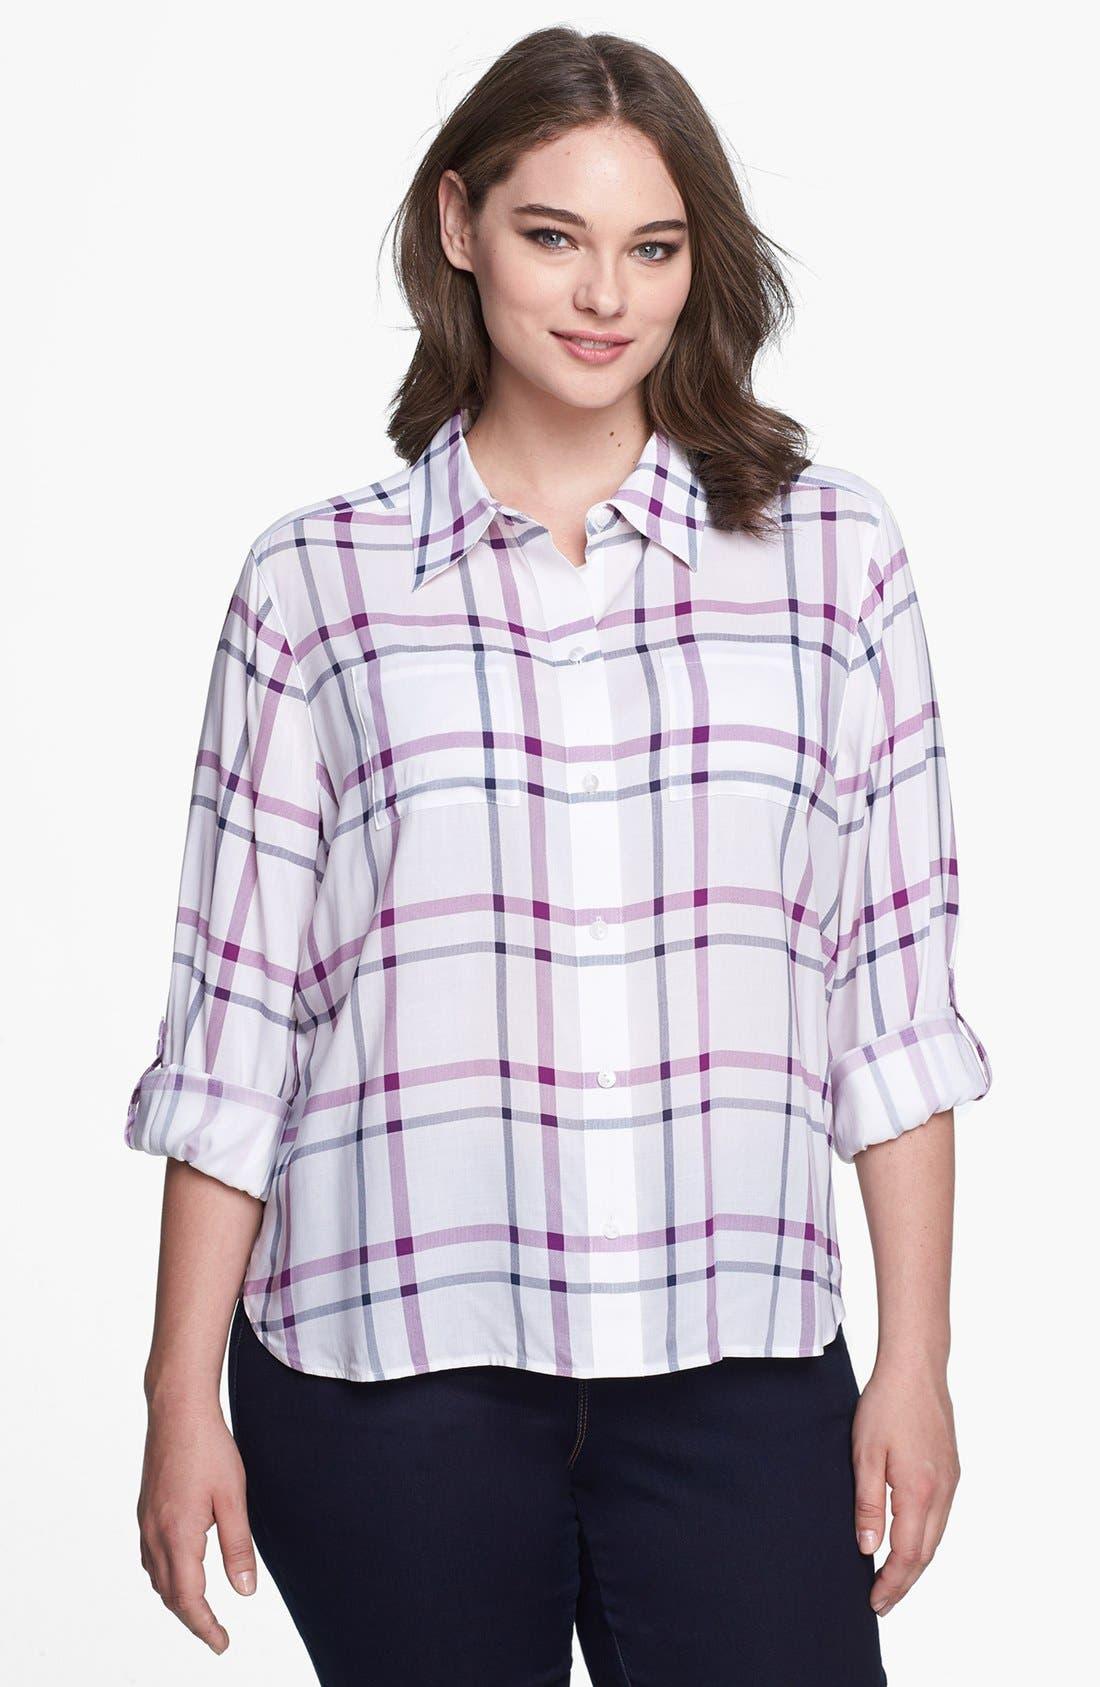 Alternate Image 1 Selected - Foxcroft Windowpane Plaid Shirt (Plus Size)